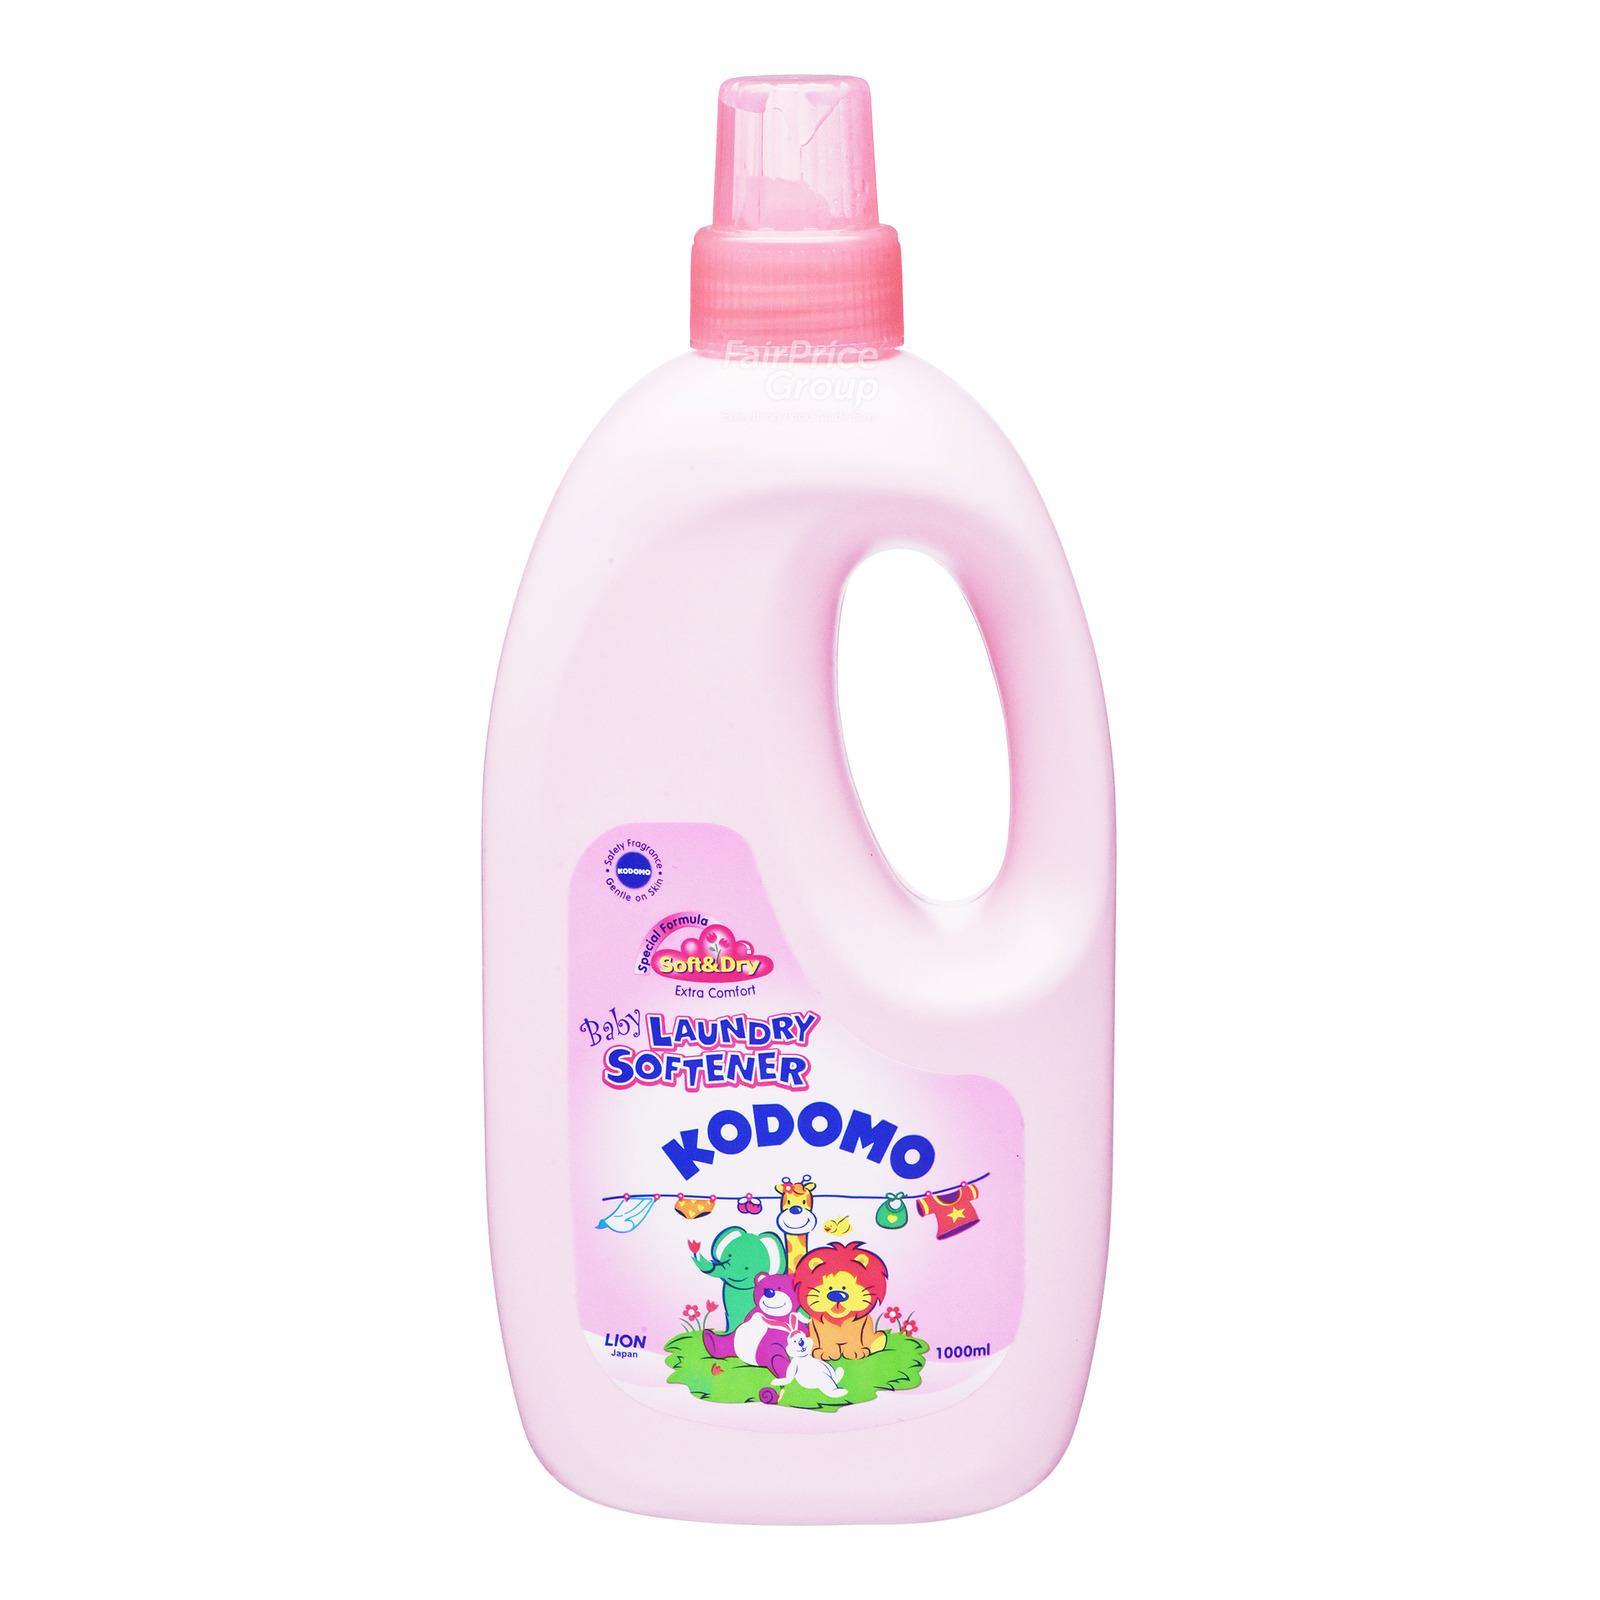 KODOMO baby laundry softener 1l